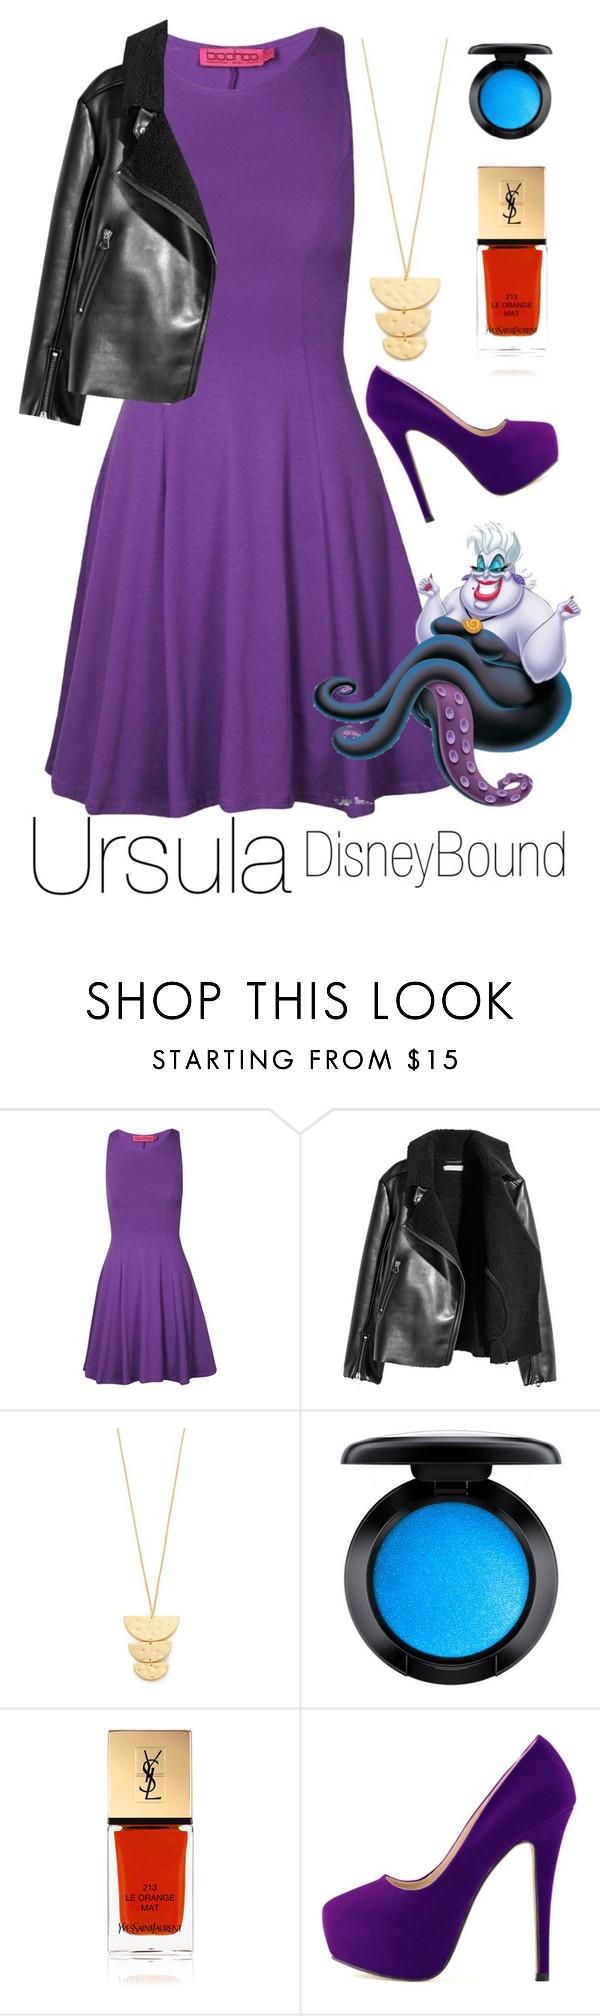 Ursula DisneyBound Fashion outfits, Fashion, Disneybound